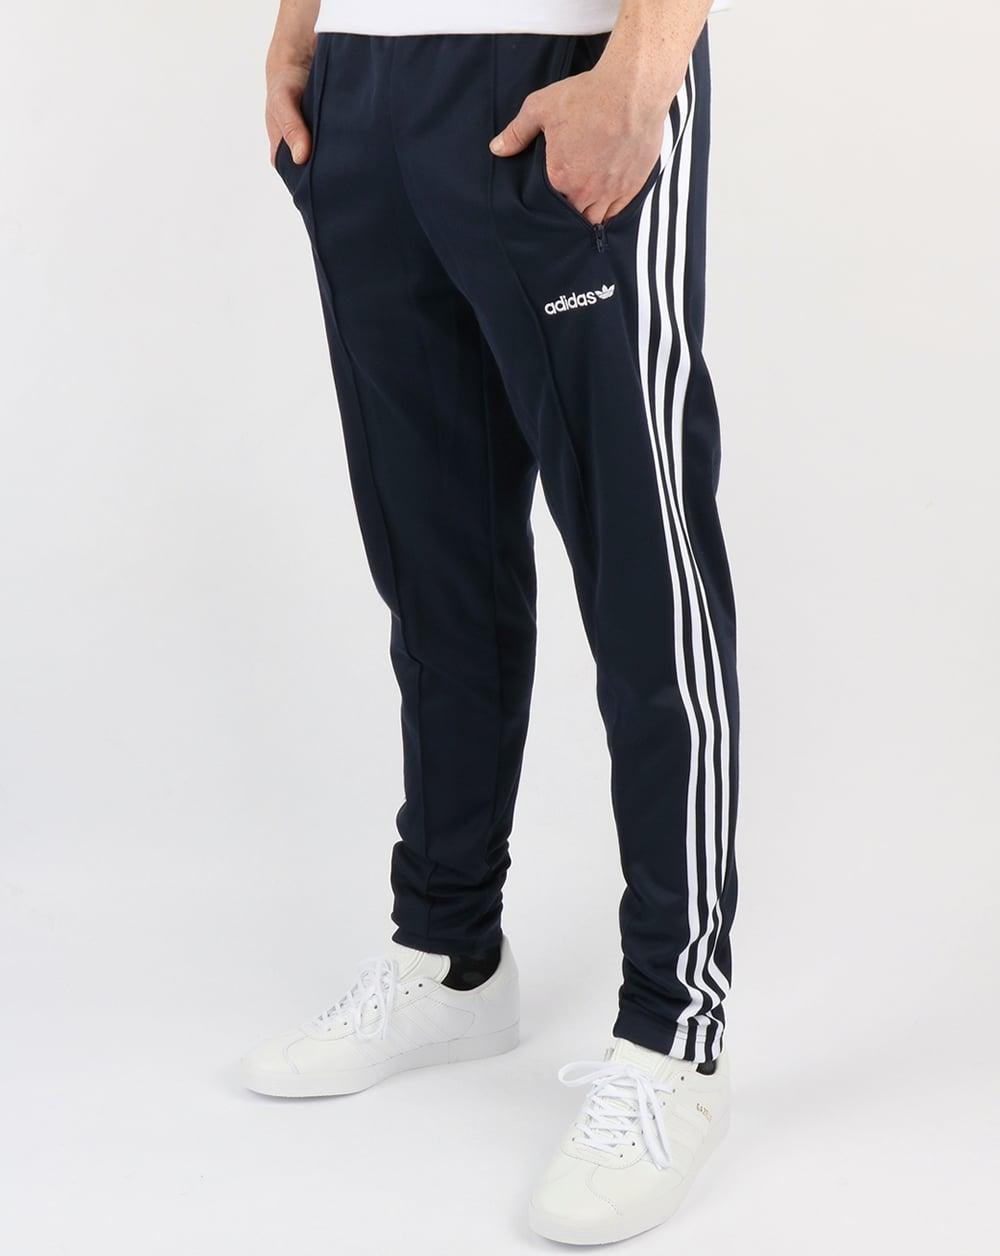 new concept 39b11 c963f adidas Originals Adidas Originals Beckenbauer Track Pants Navy